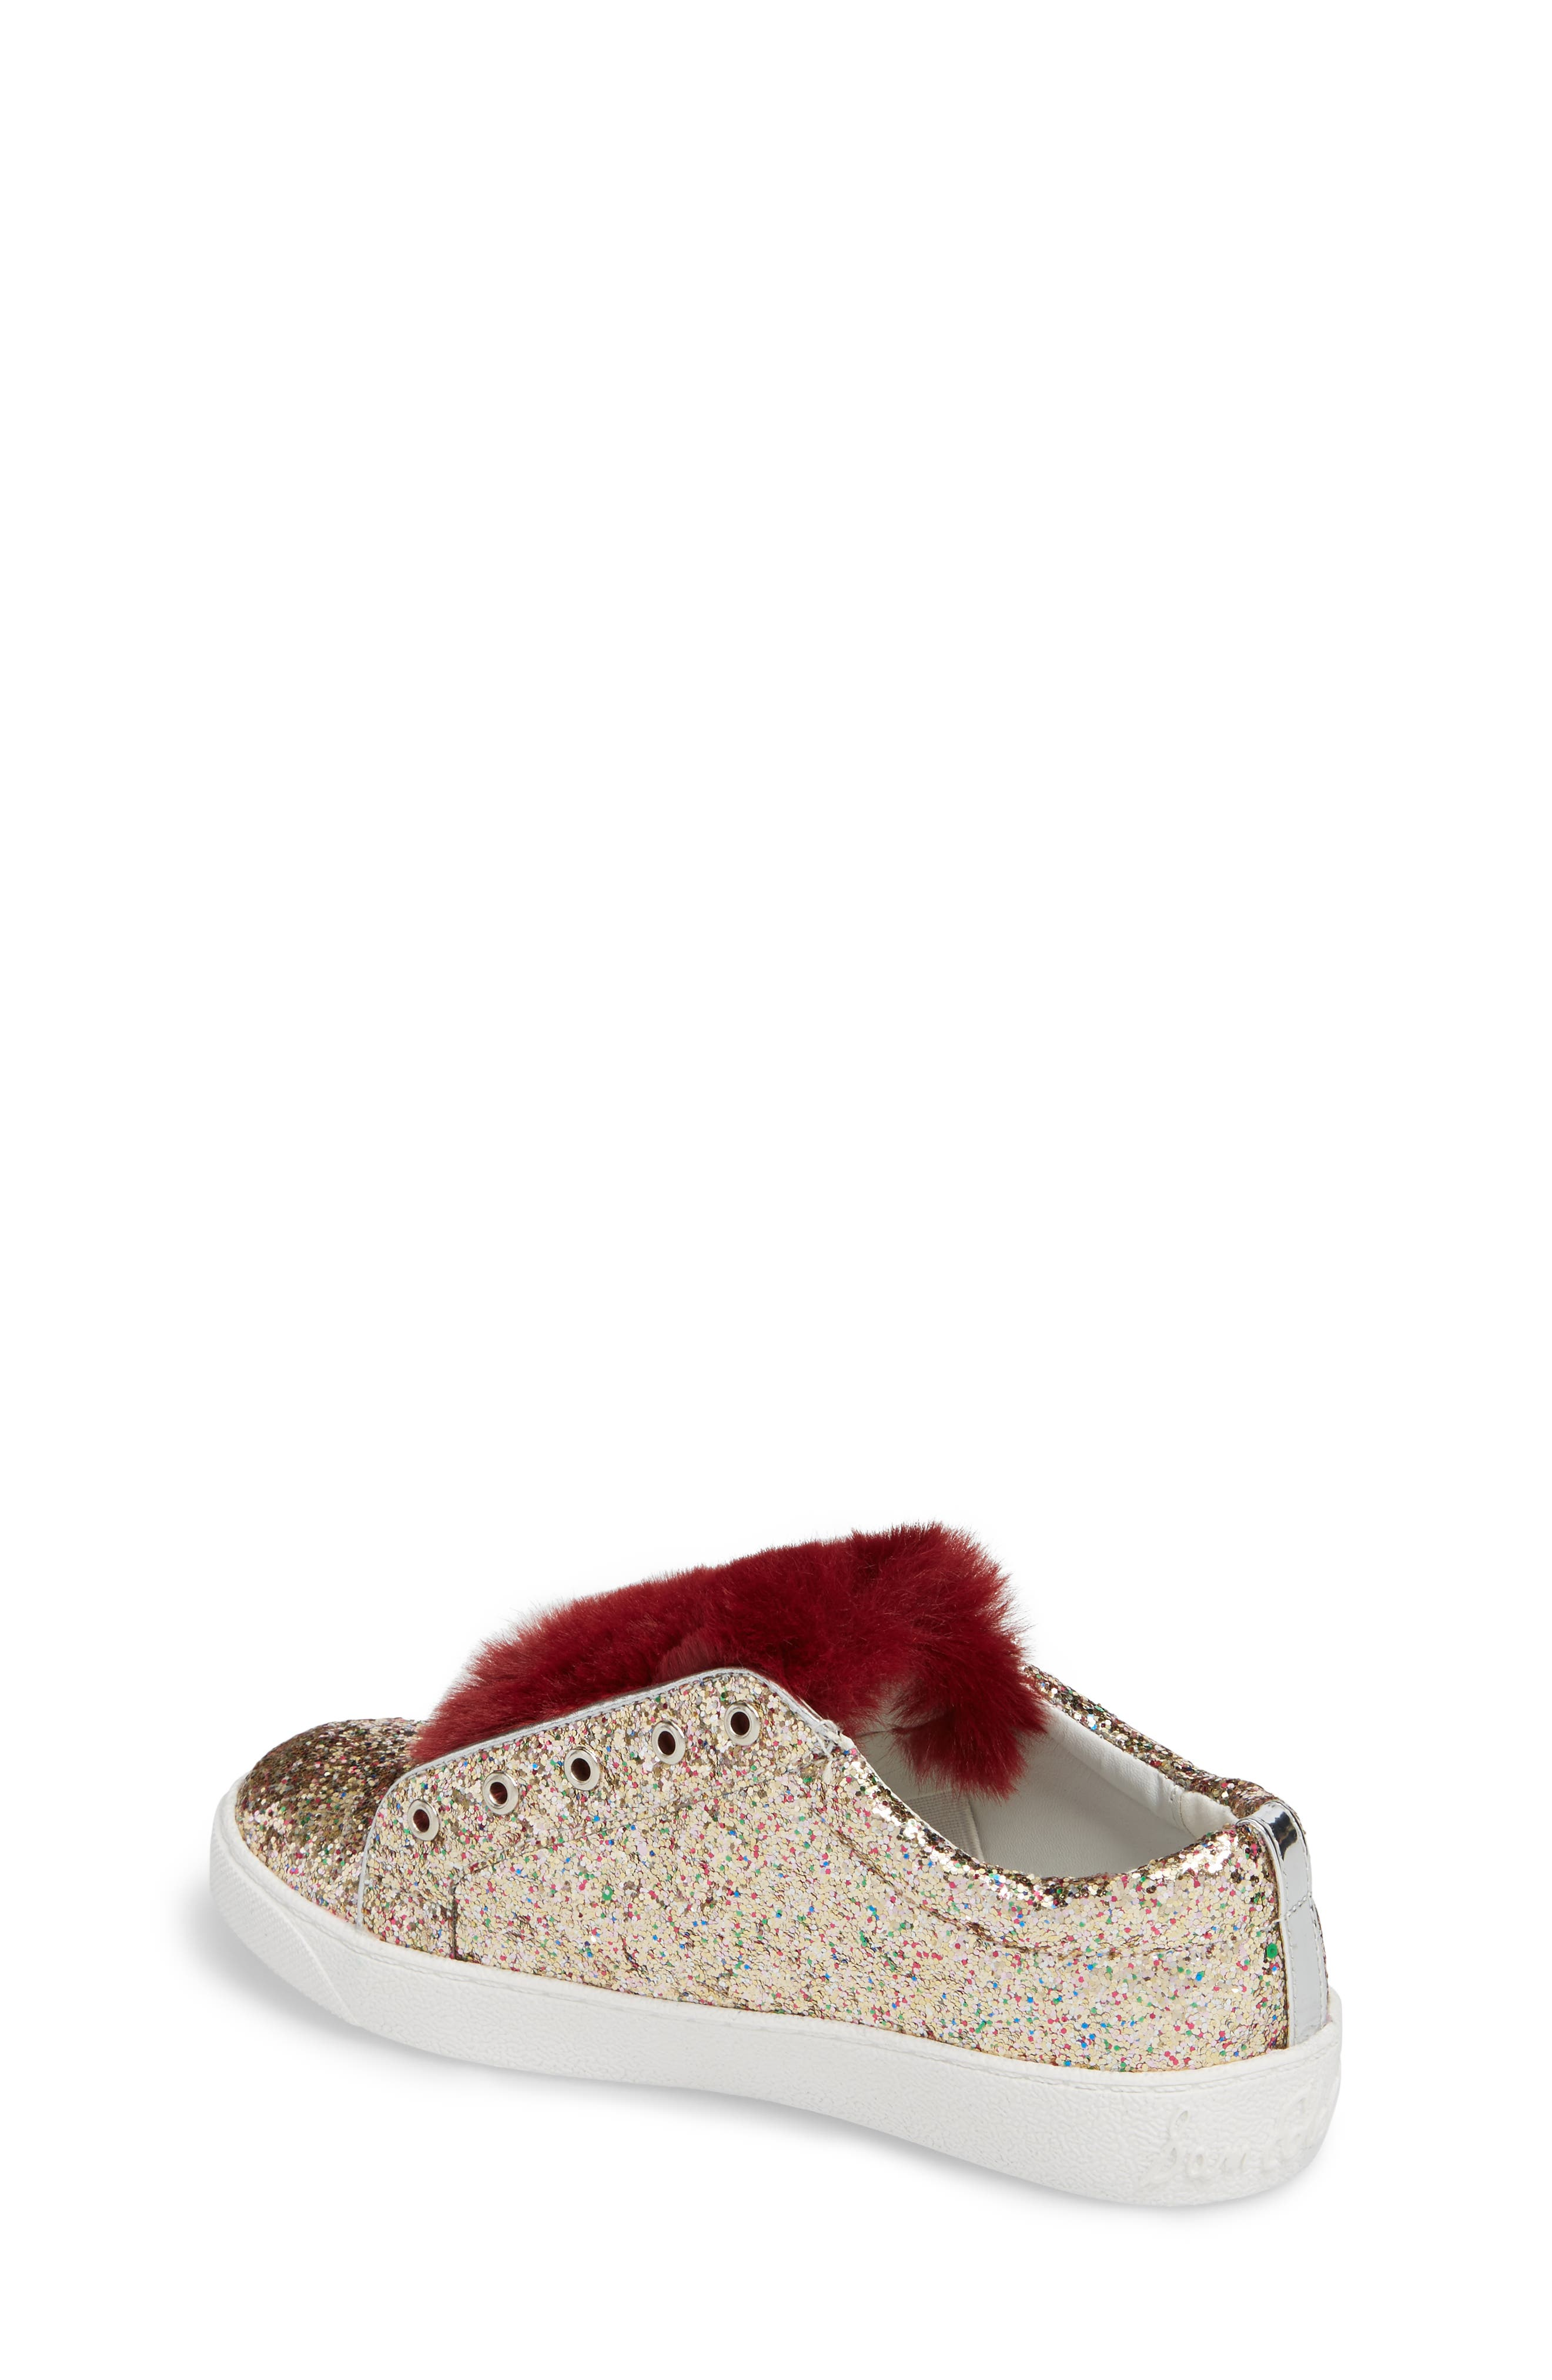 Alternate Image 2  - Sam Edelman Britt Rita Faux Fur Glitter Sneaker (Toddler, Little Kid & Big Kid)